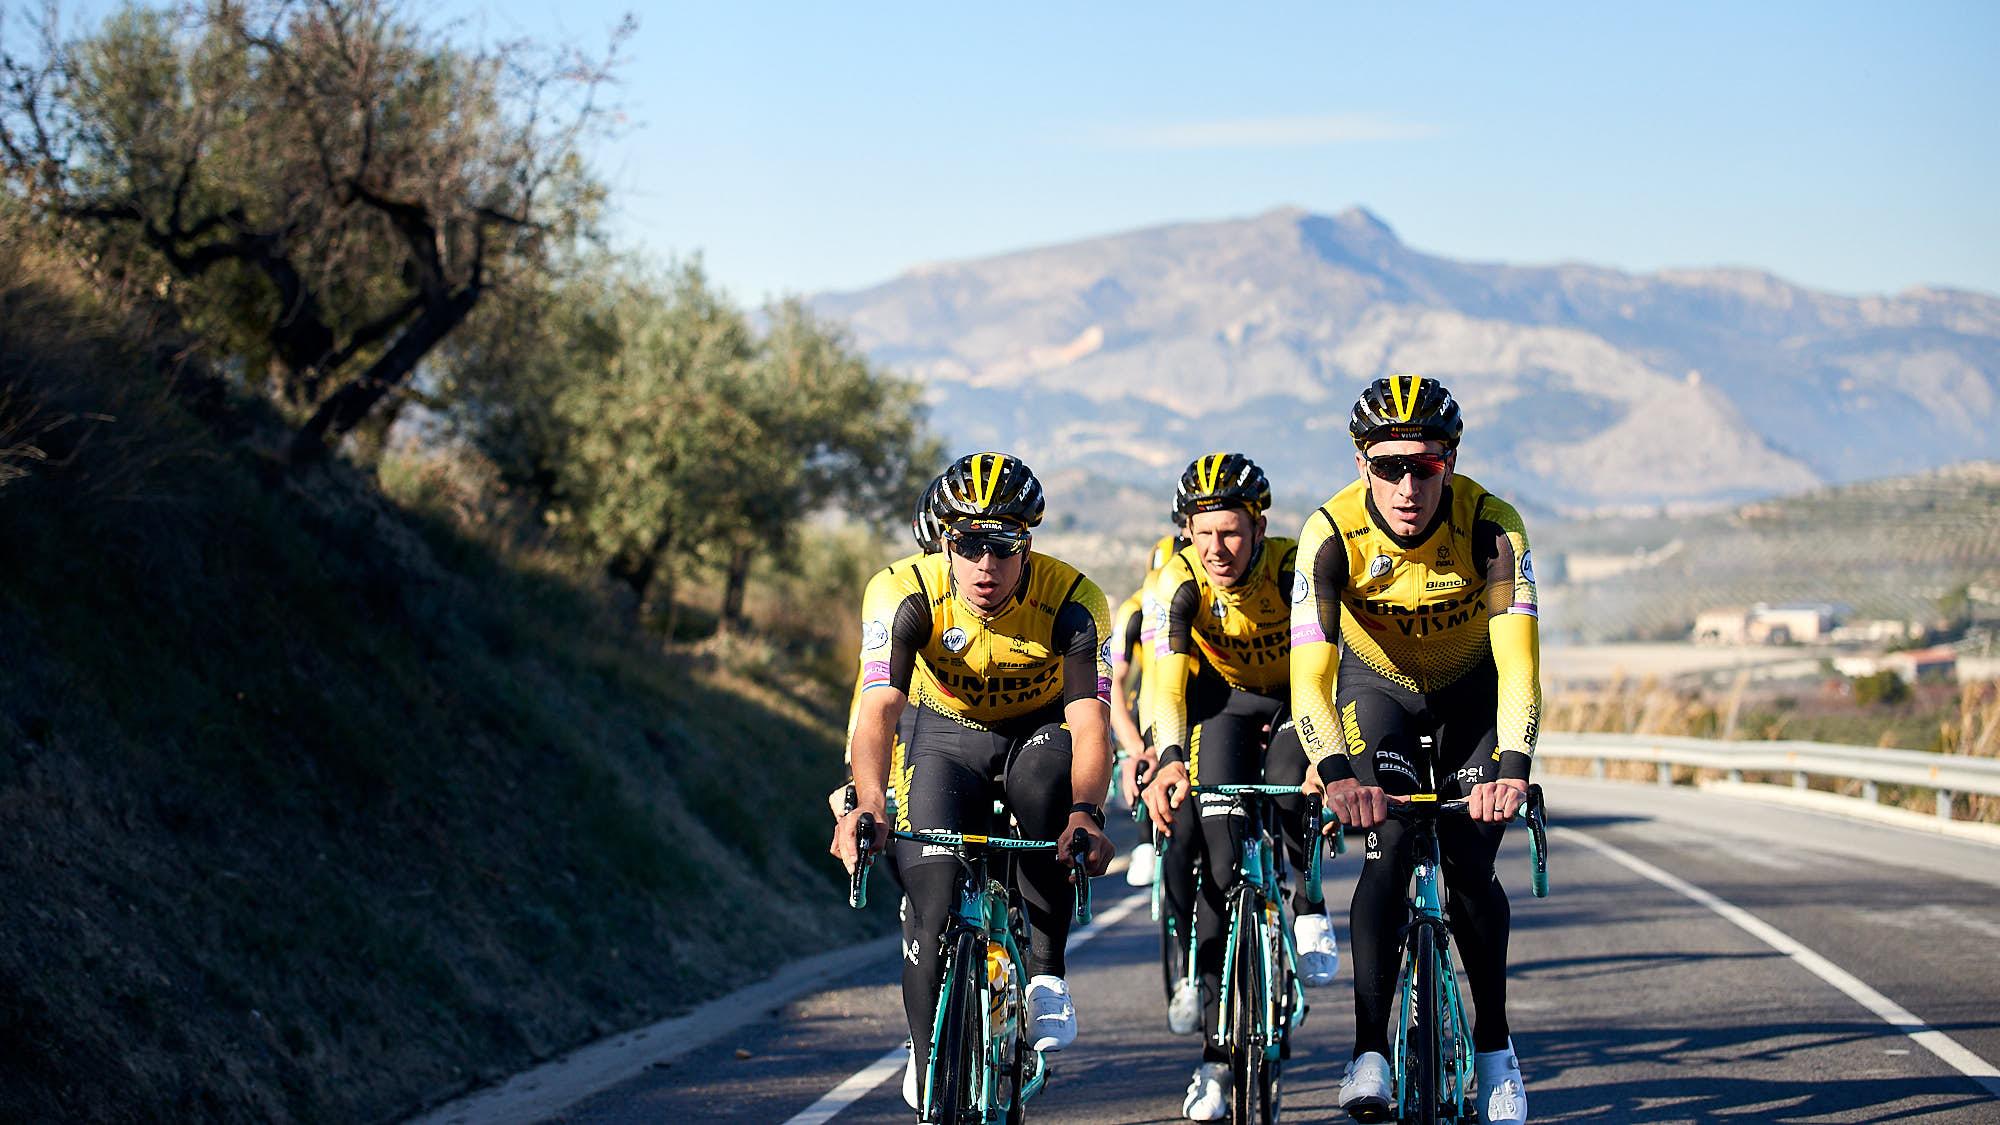 Jumbo-Visma riders during training in Spain